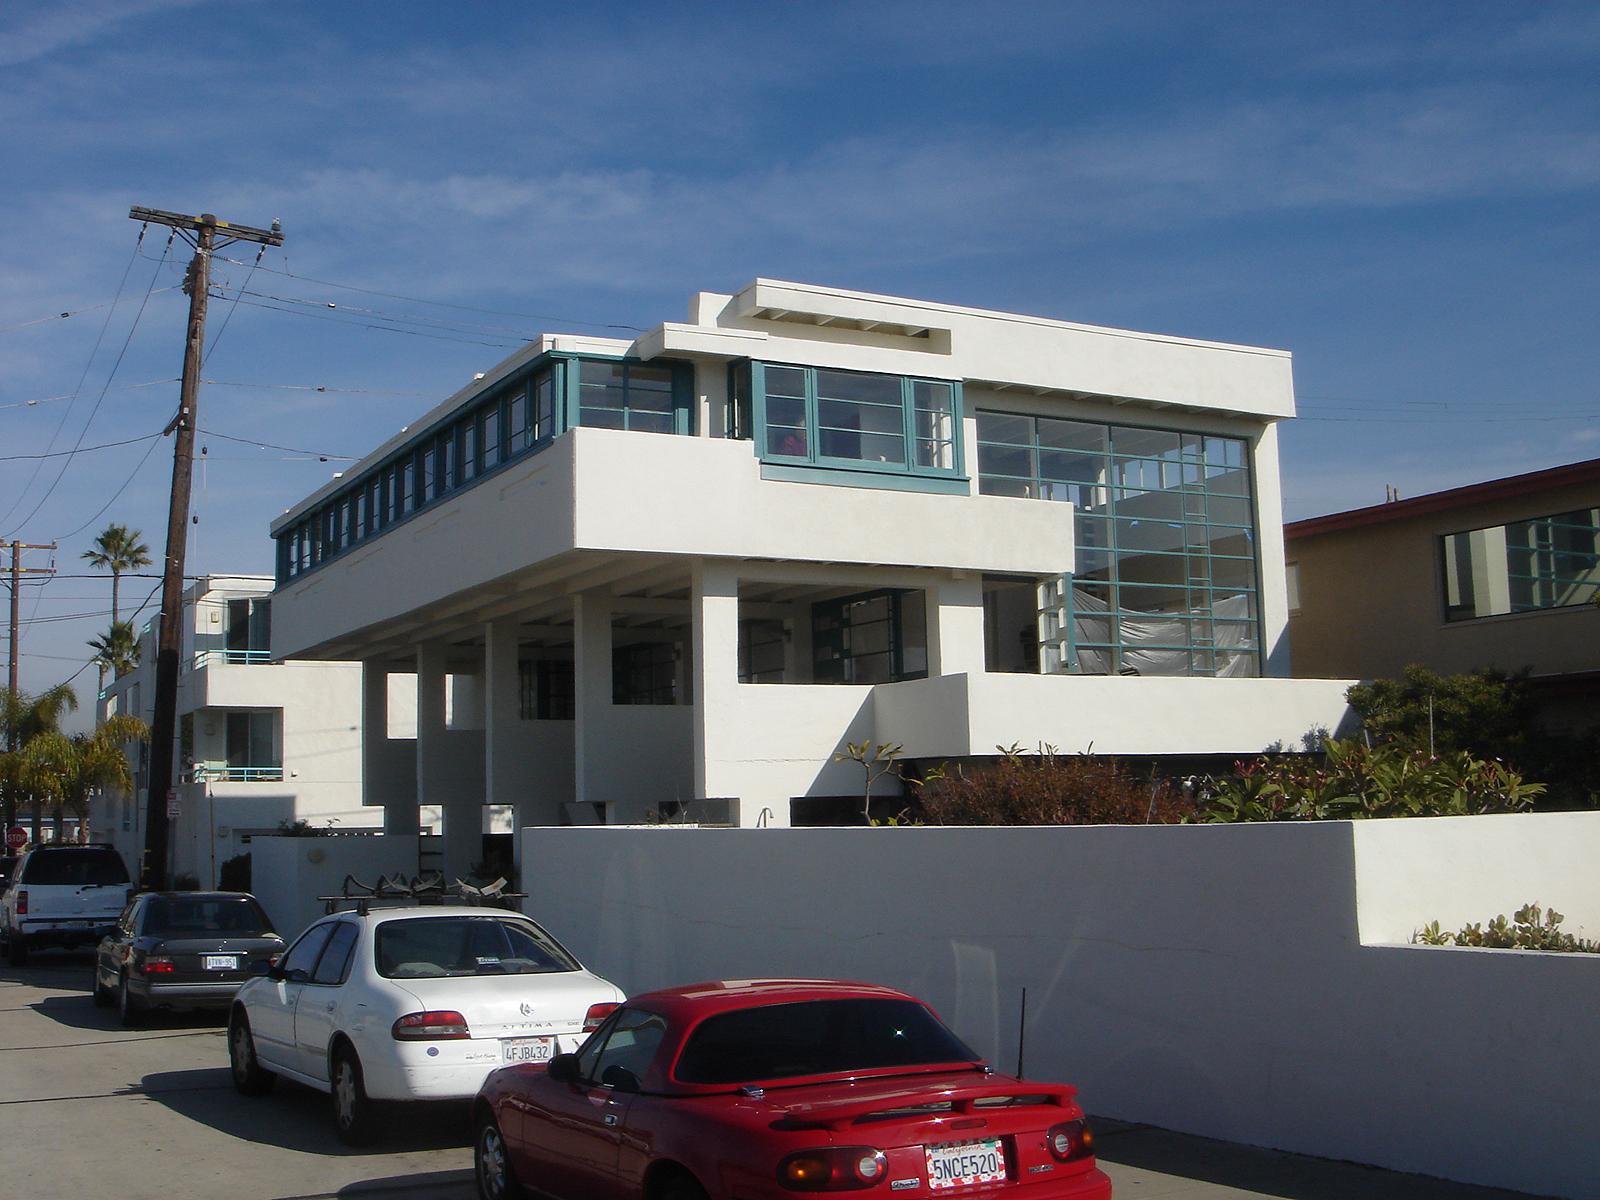 File:Lovell Beach House 02.jpg - Wikipedia